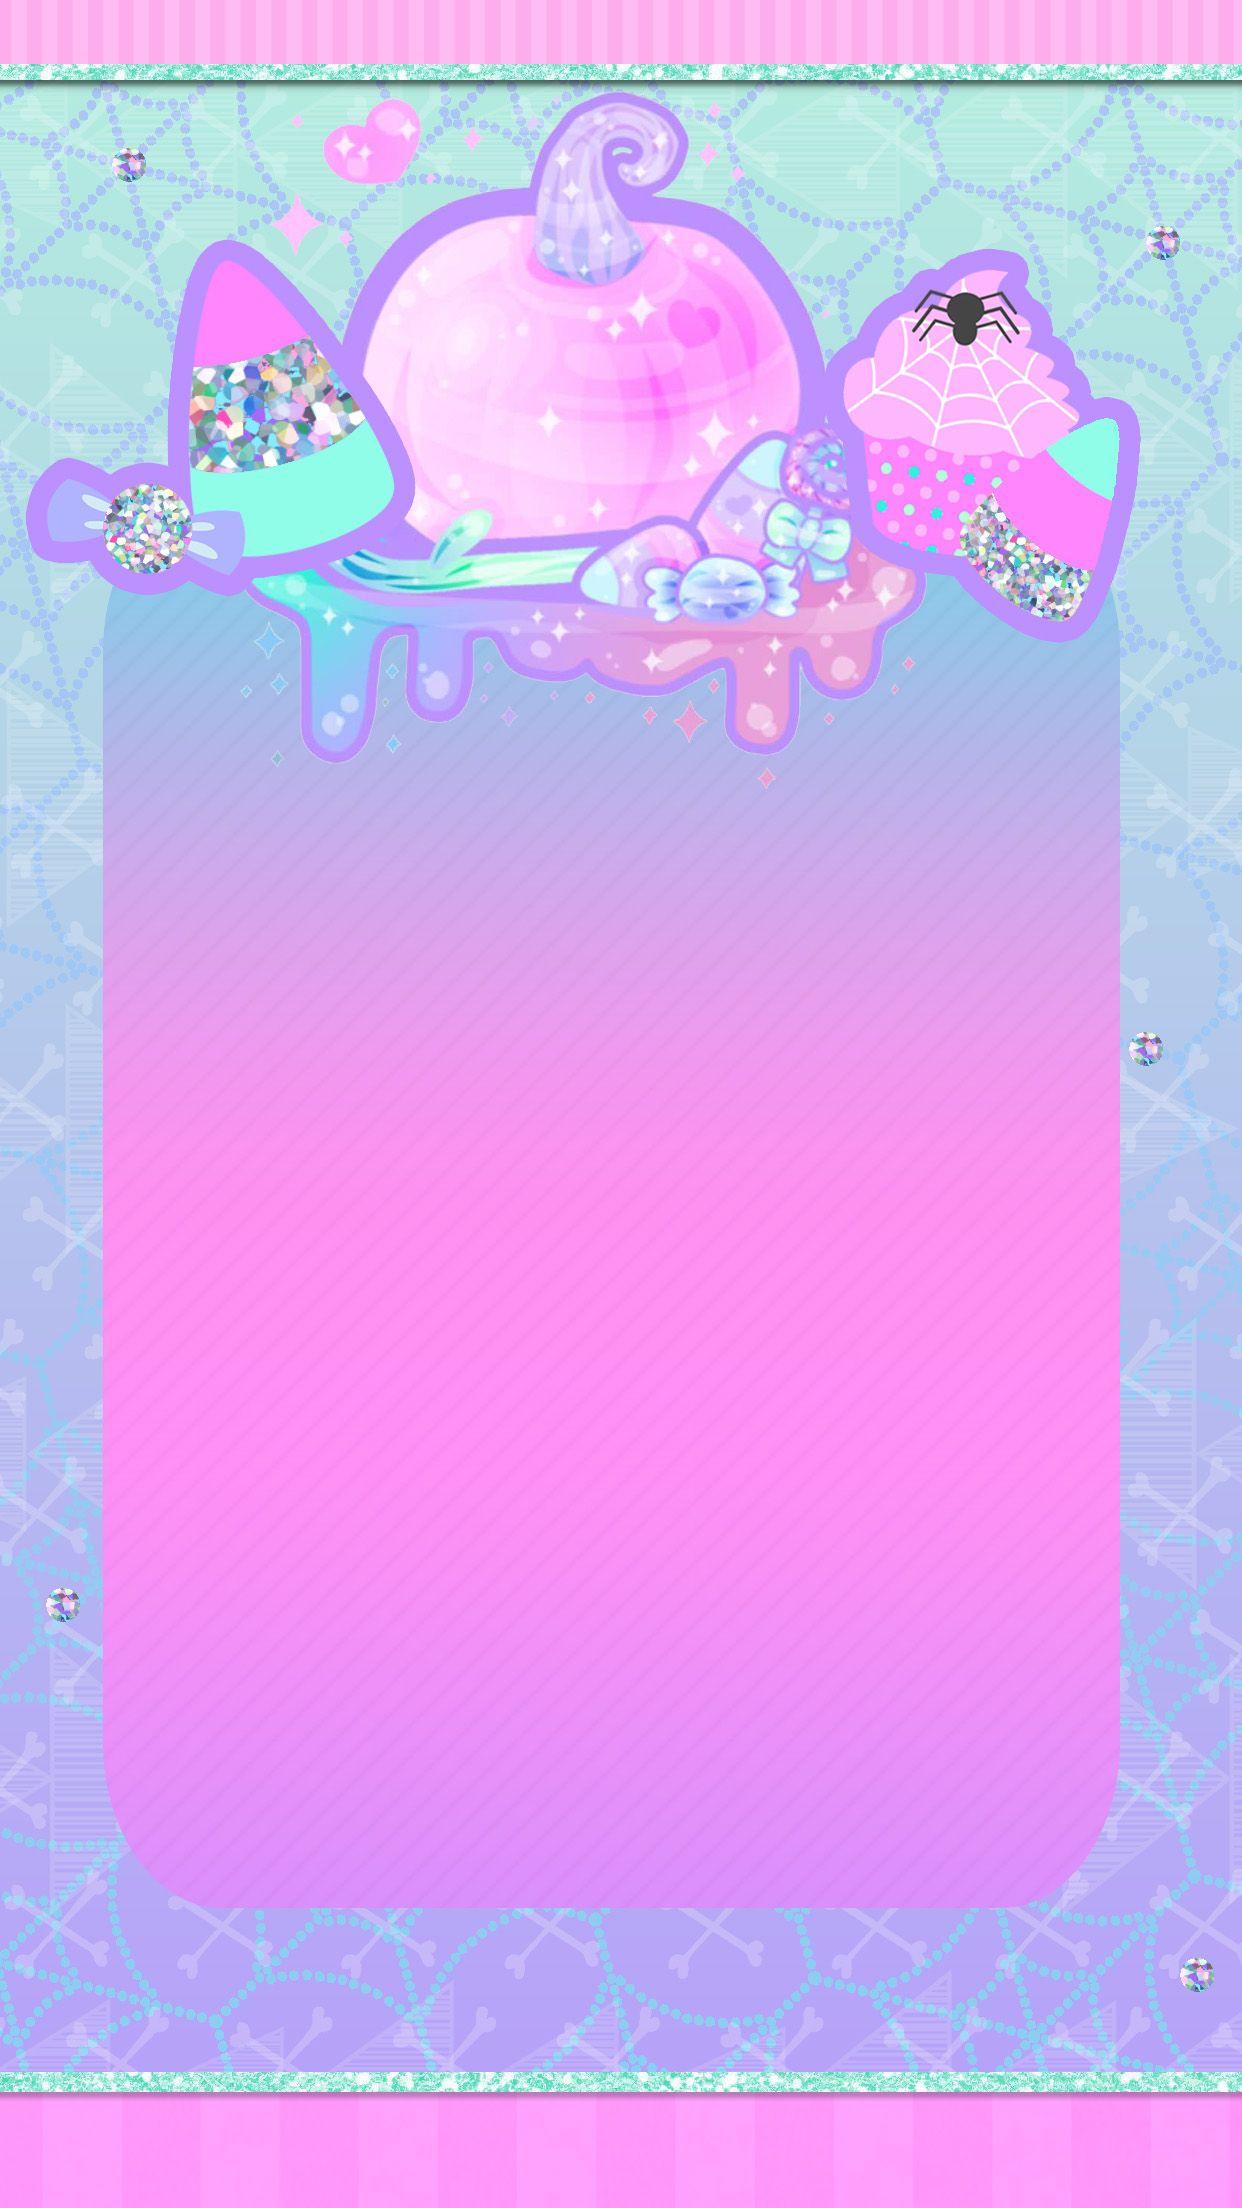 Amazing Wallpaper Halloween Pink - 0f55dd22c2a63b70542d945942ca7551  Graphic_182652.jpg